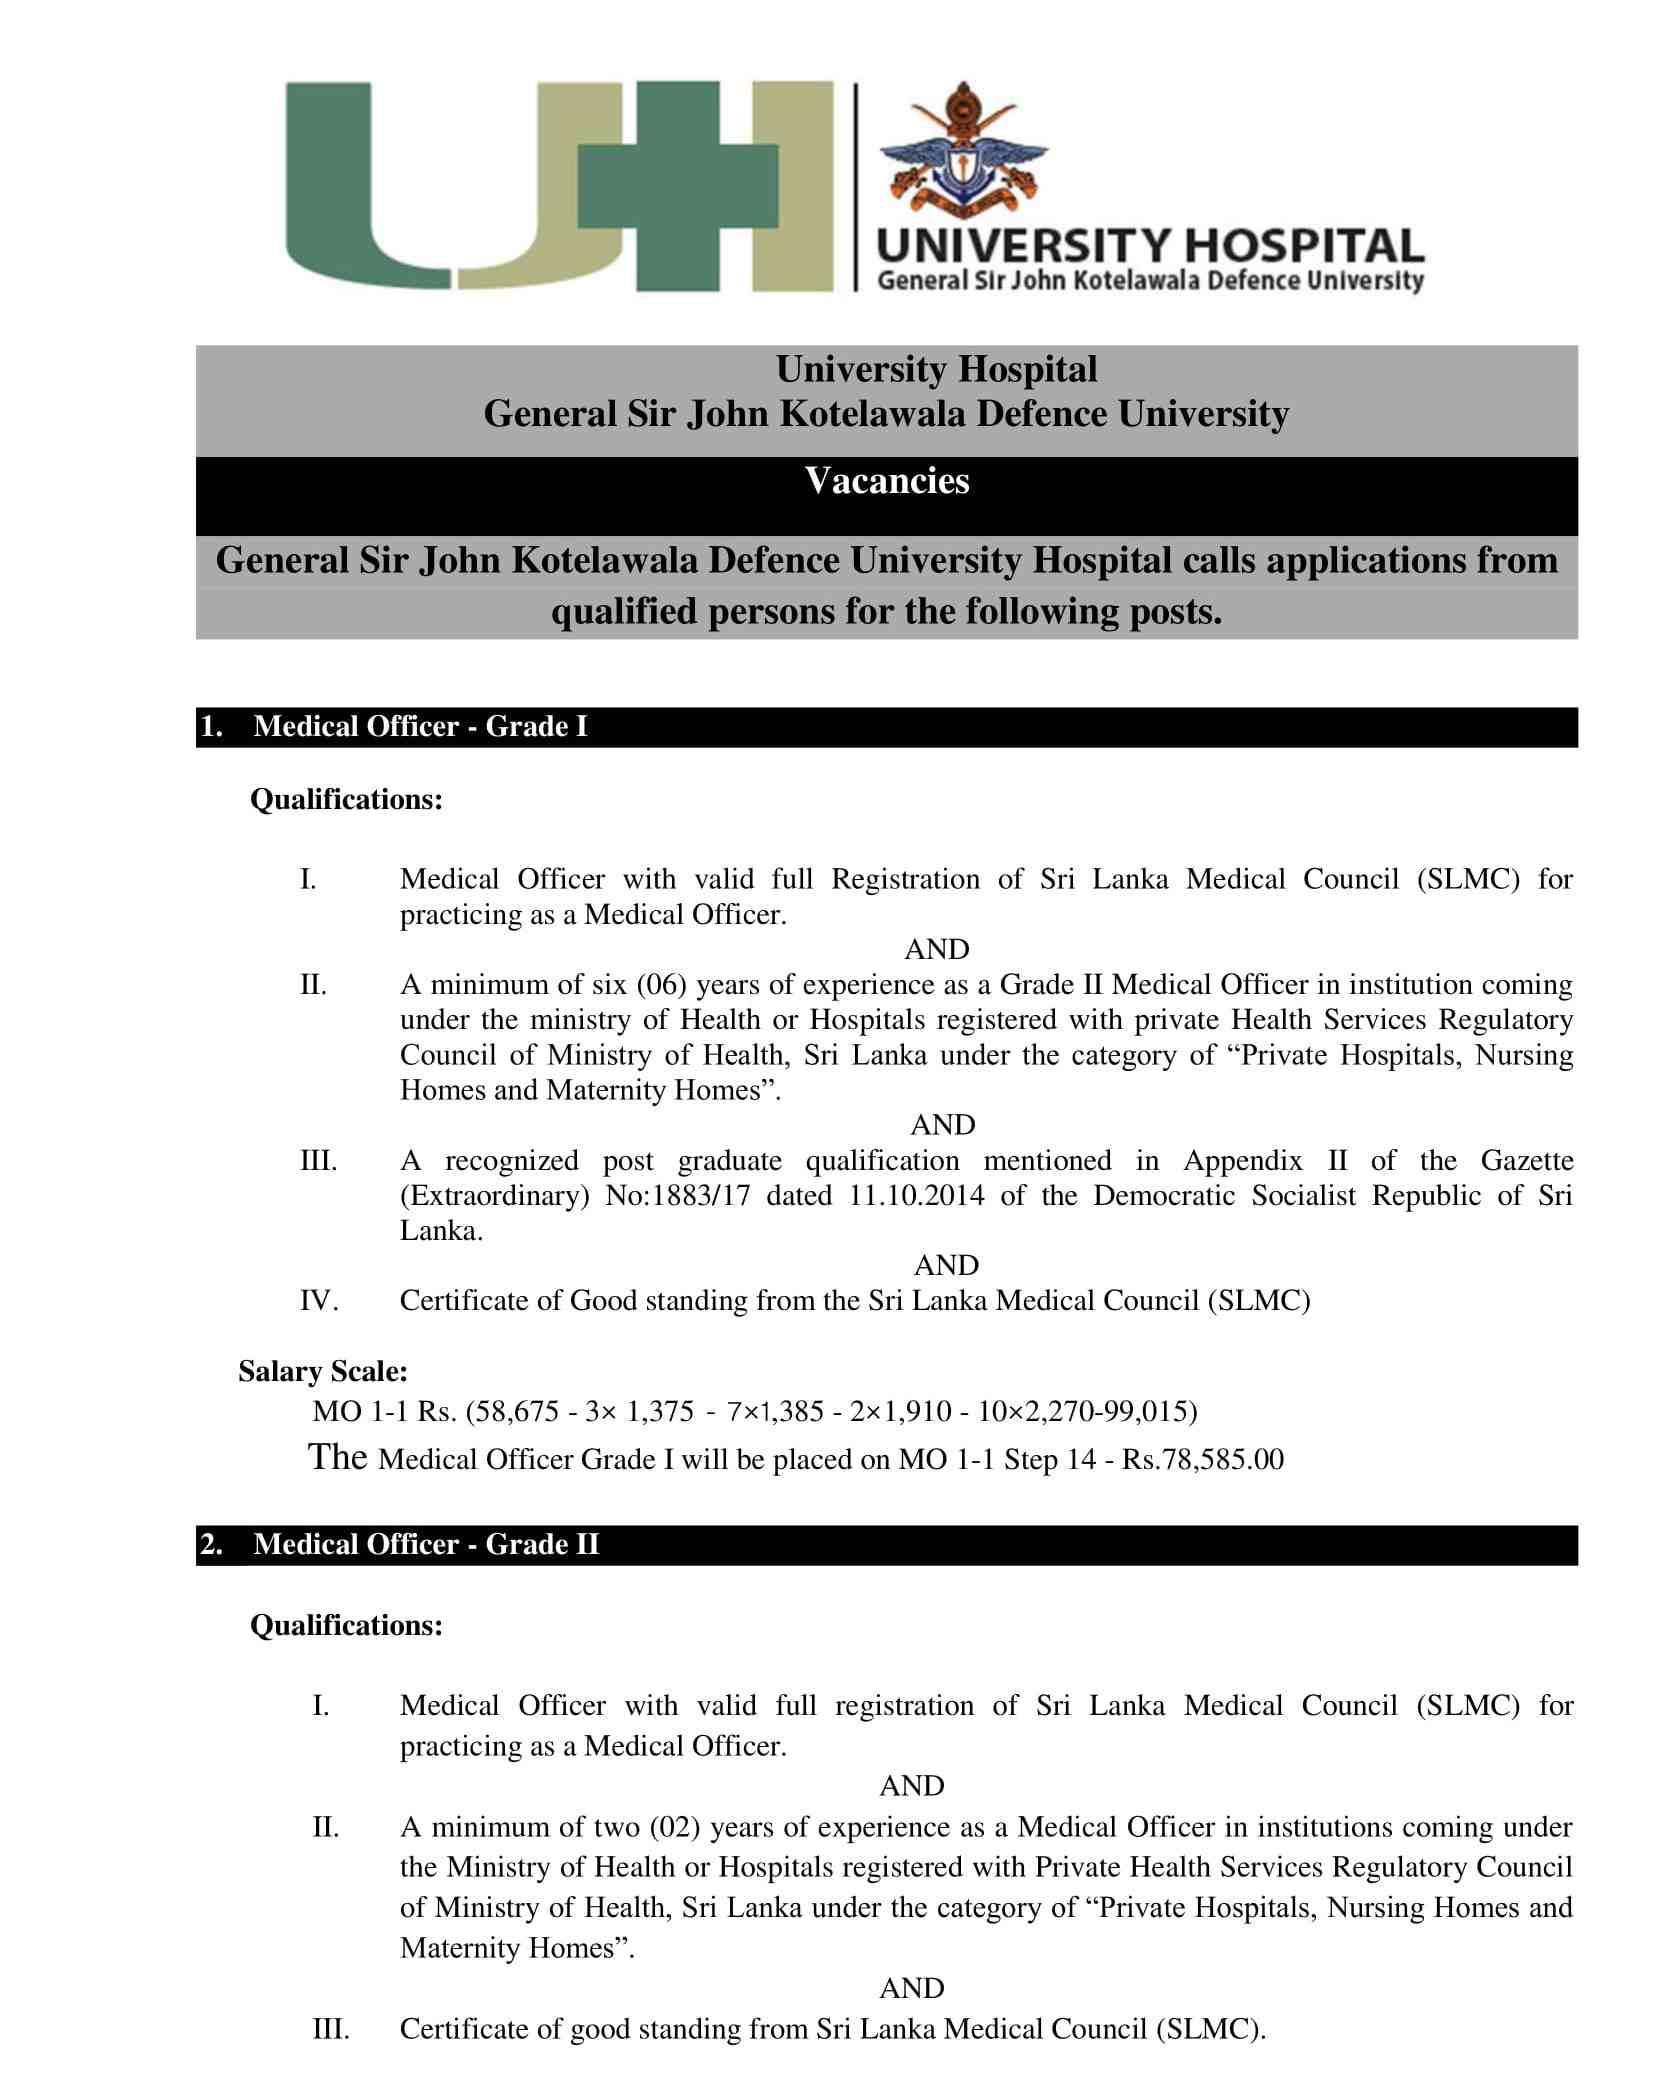 General Sir John Kotelawala Defence University Hospital Jobs Vacancies English